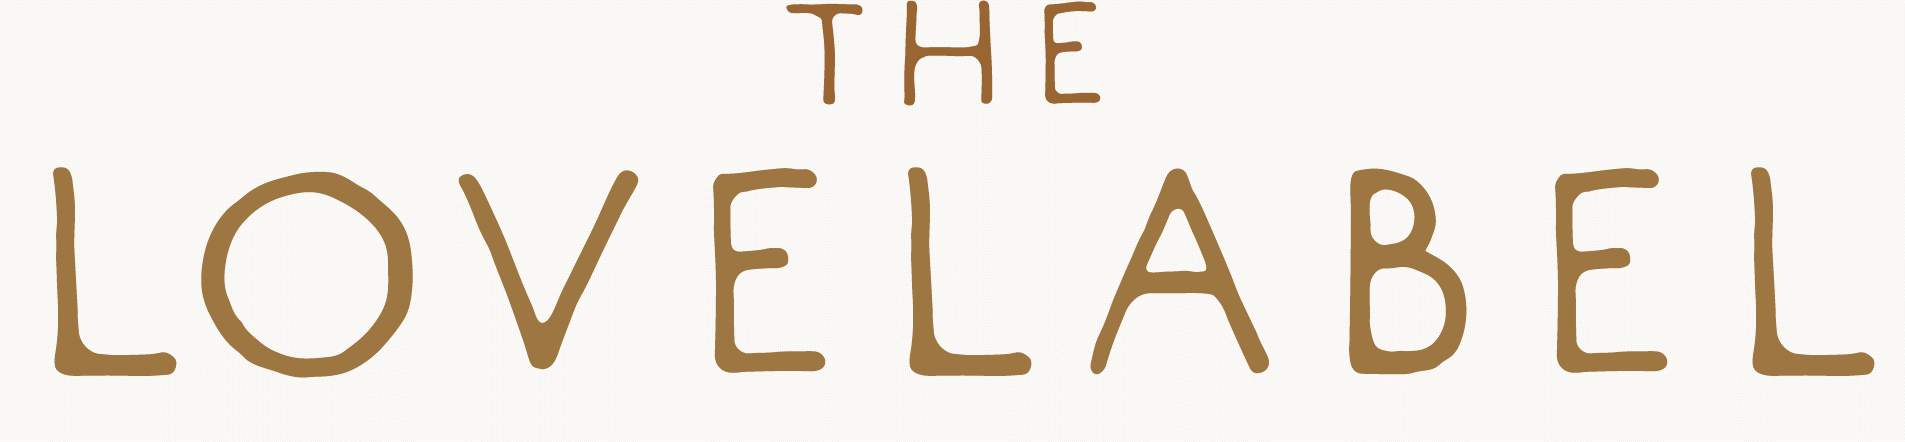 The Love Label